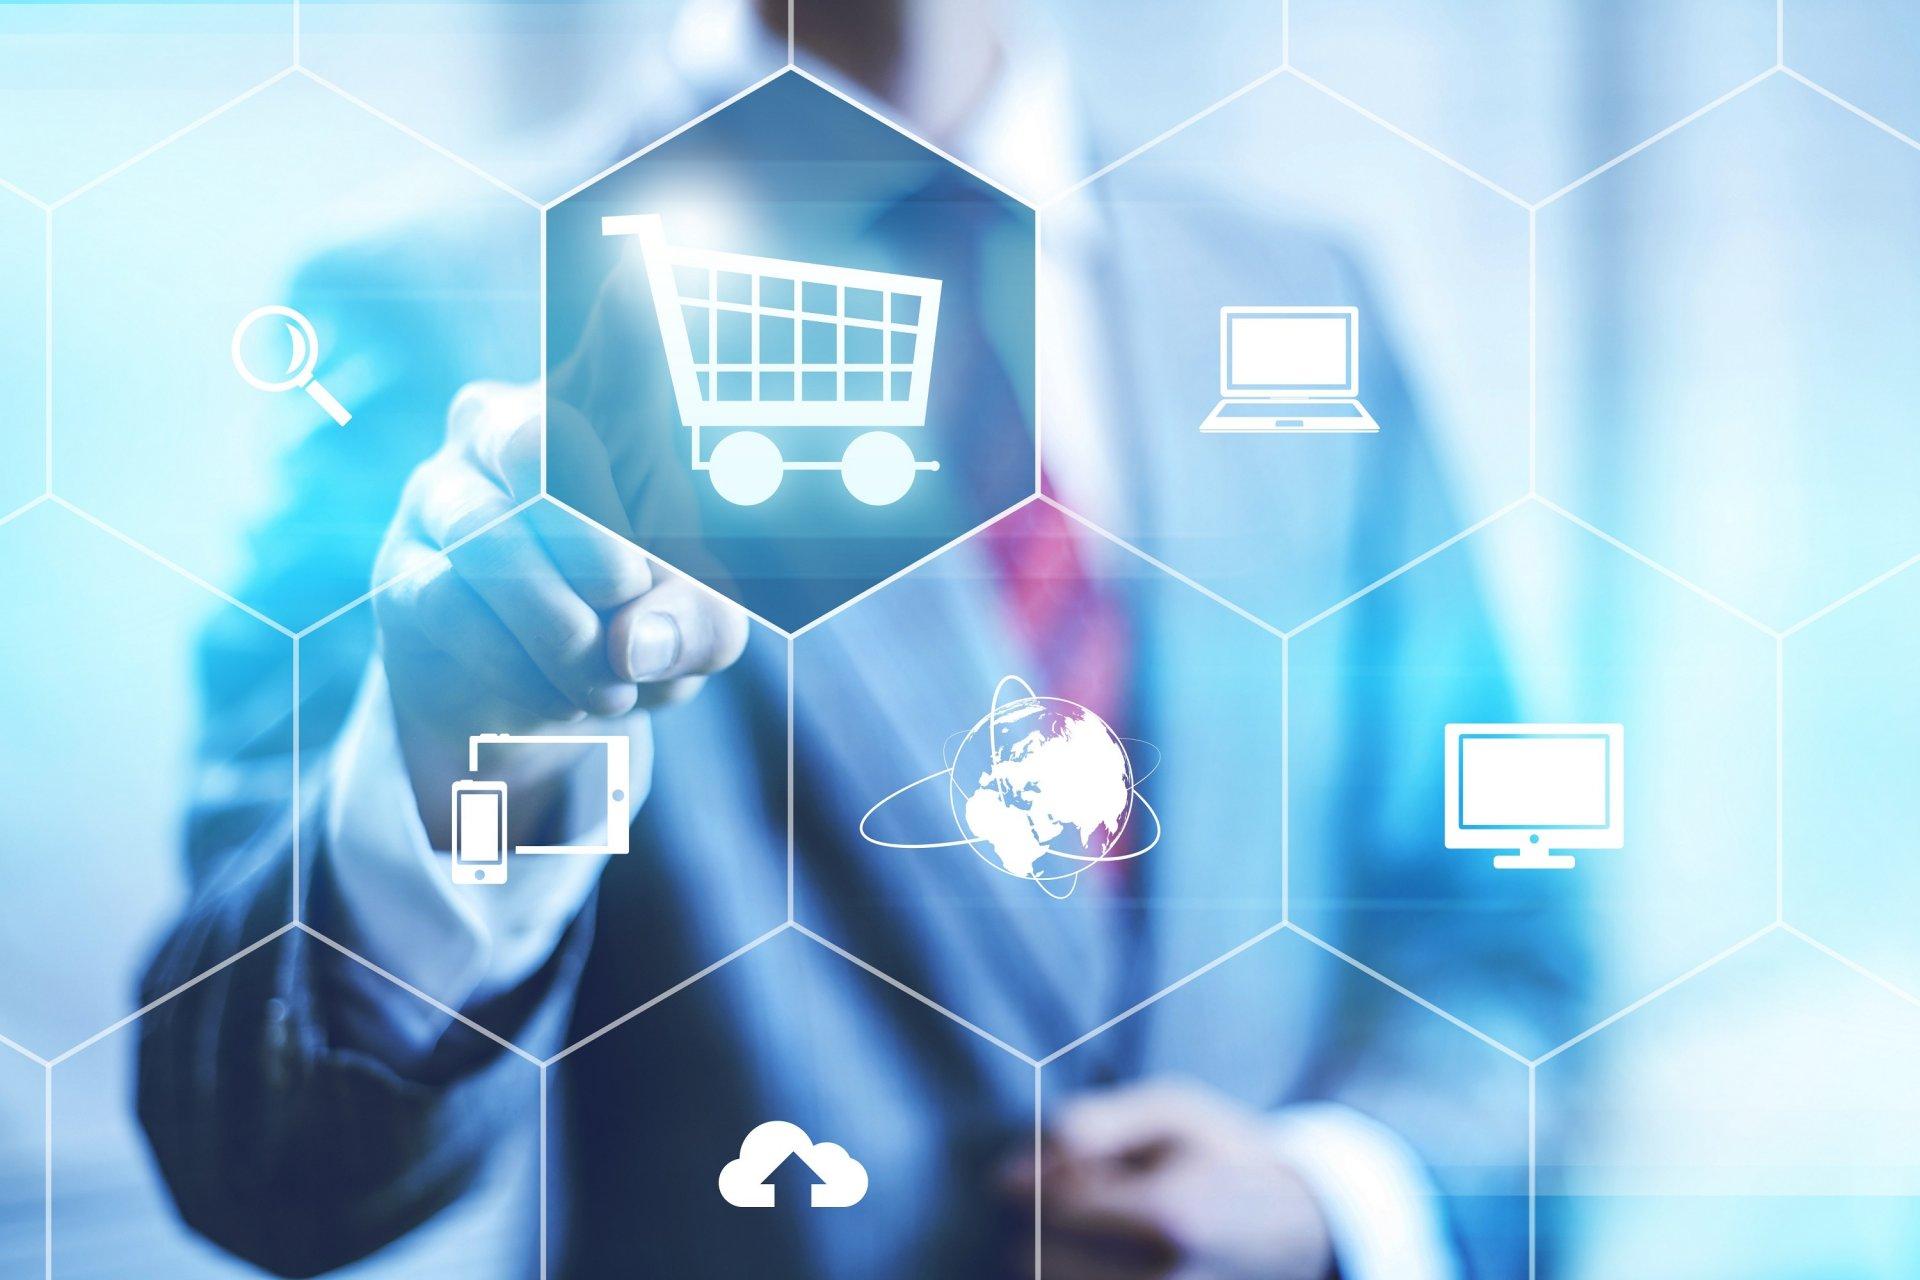 бизнес технологии